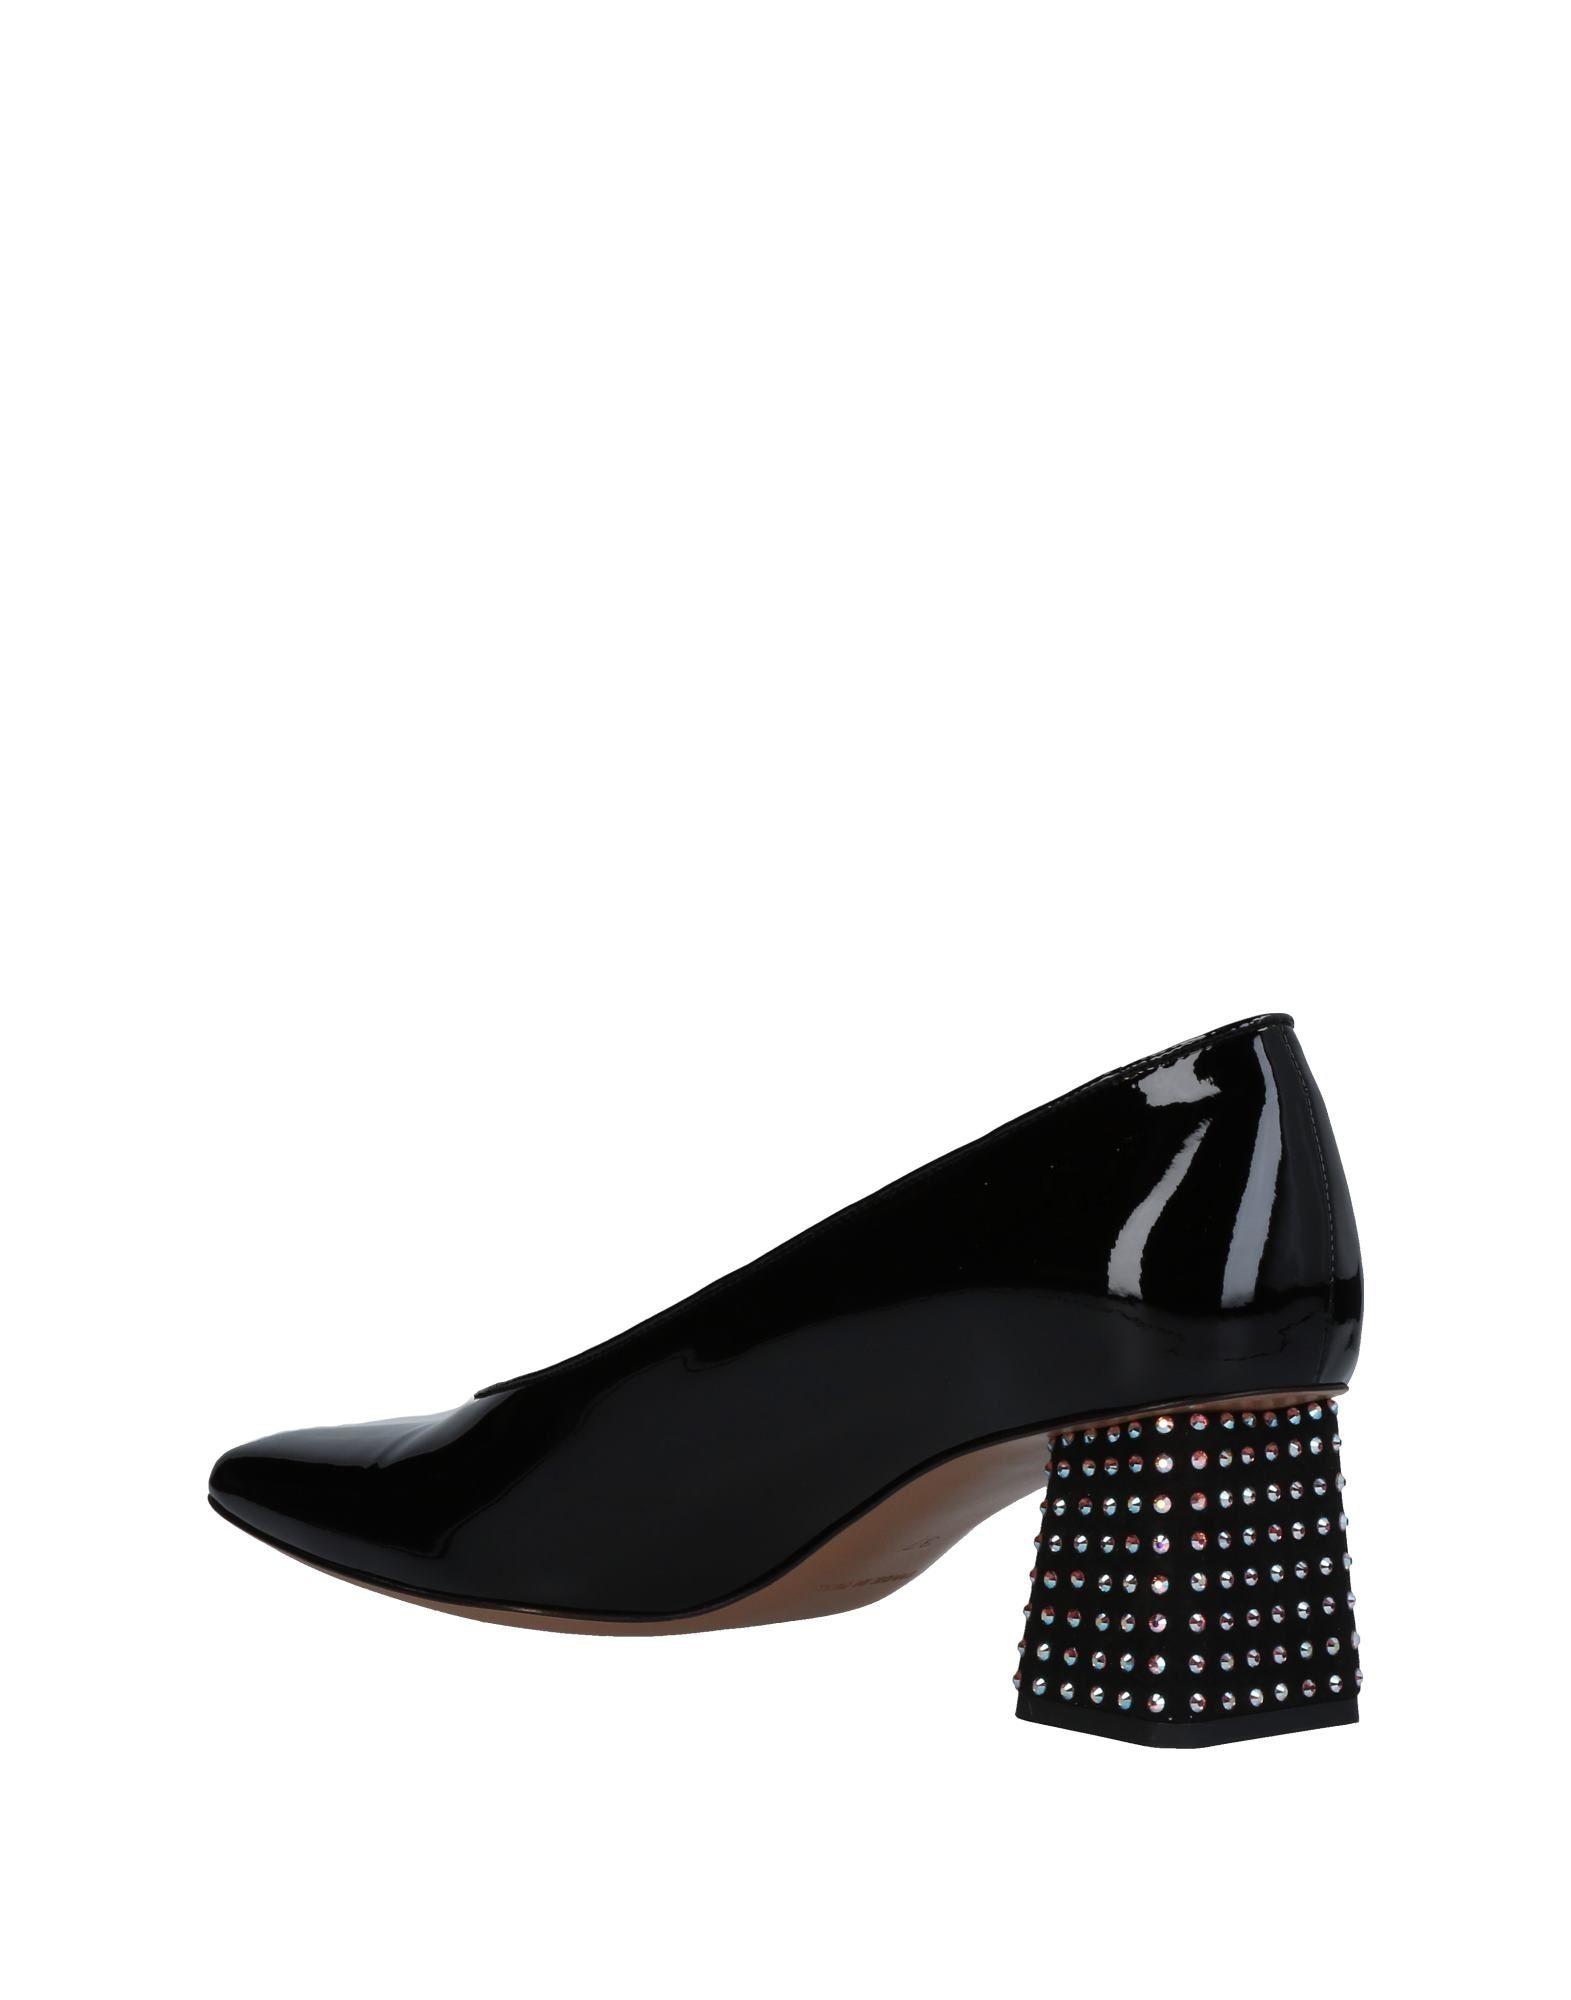 Stilvolle Damen billige Schuhe Rayne Pumps Damen Stilvolle  11456462GI a33ea6